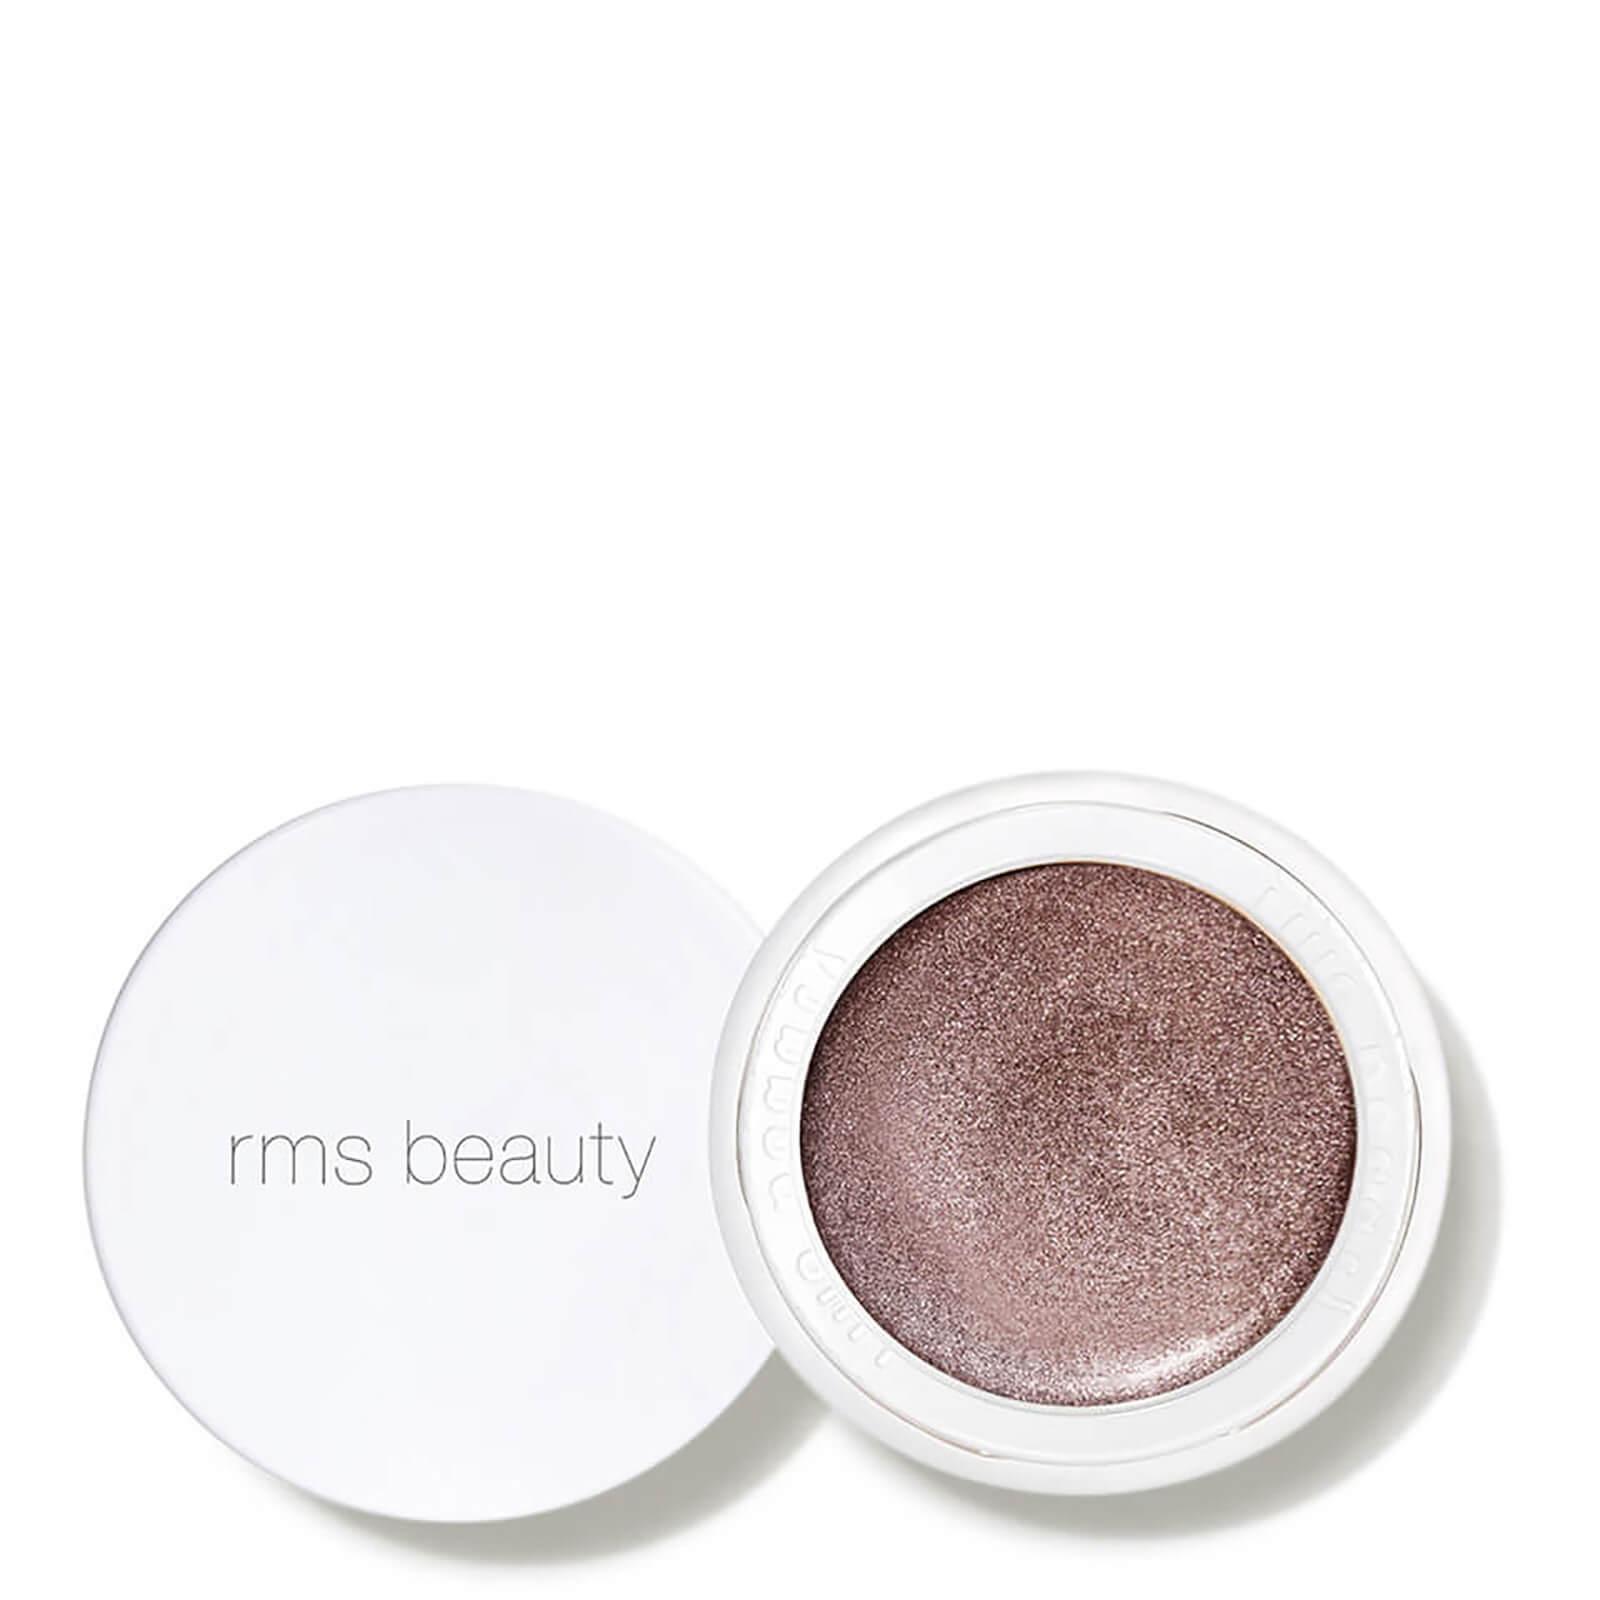 Купить RMS Beauty Eye Polish - Magnetic